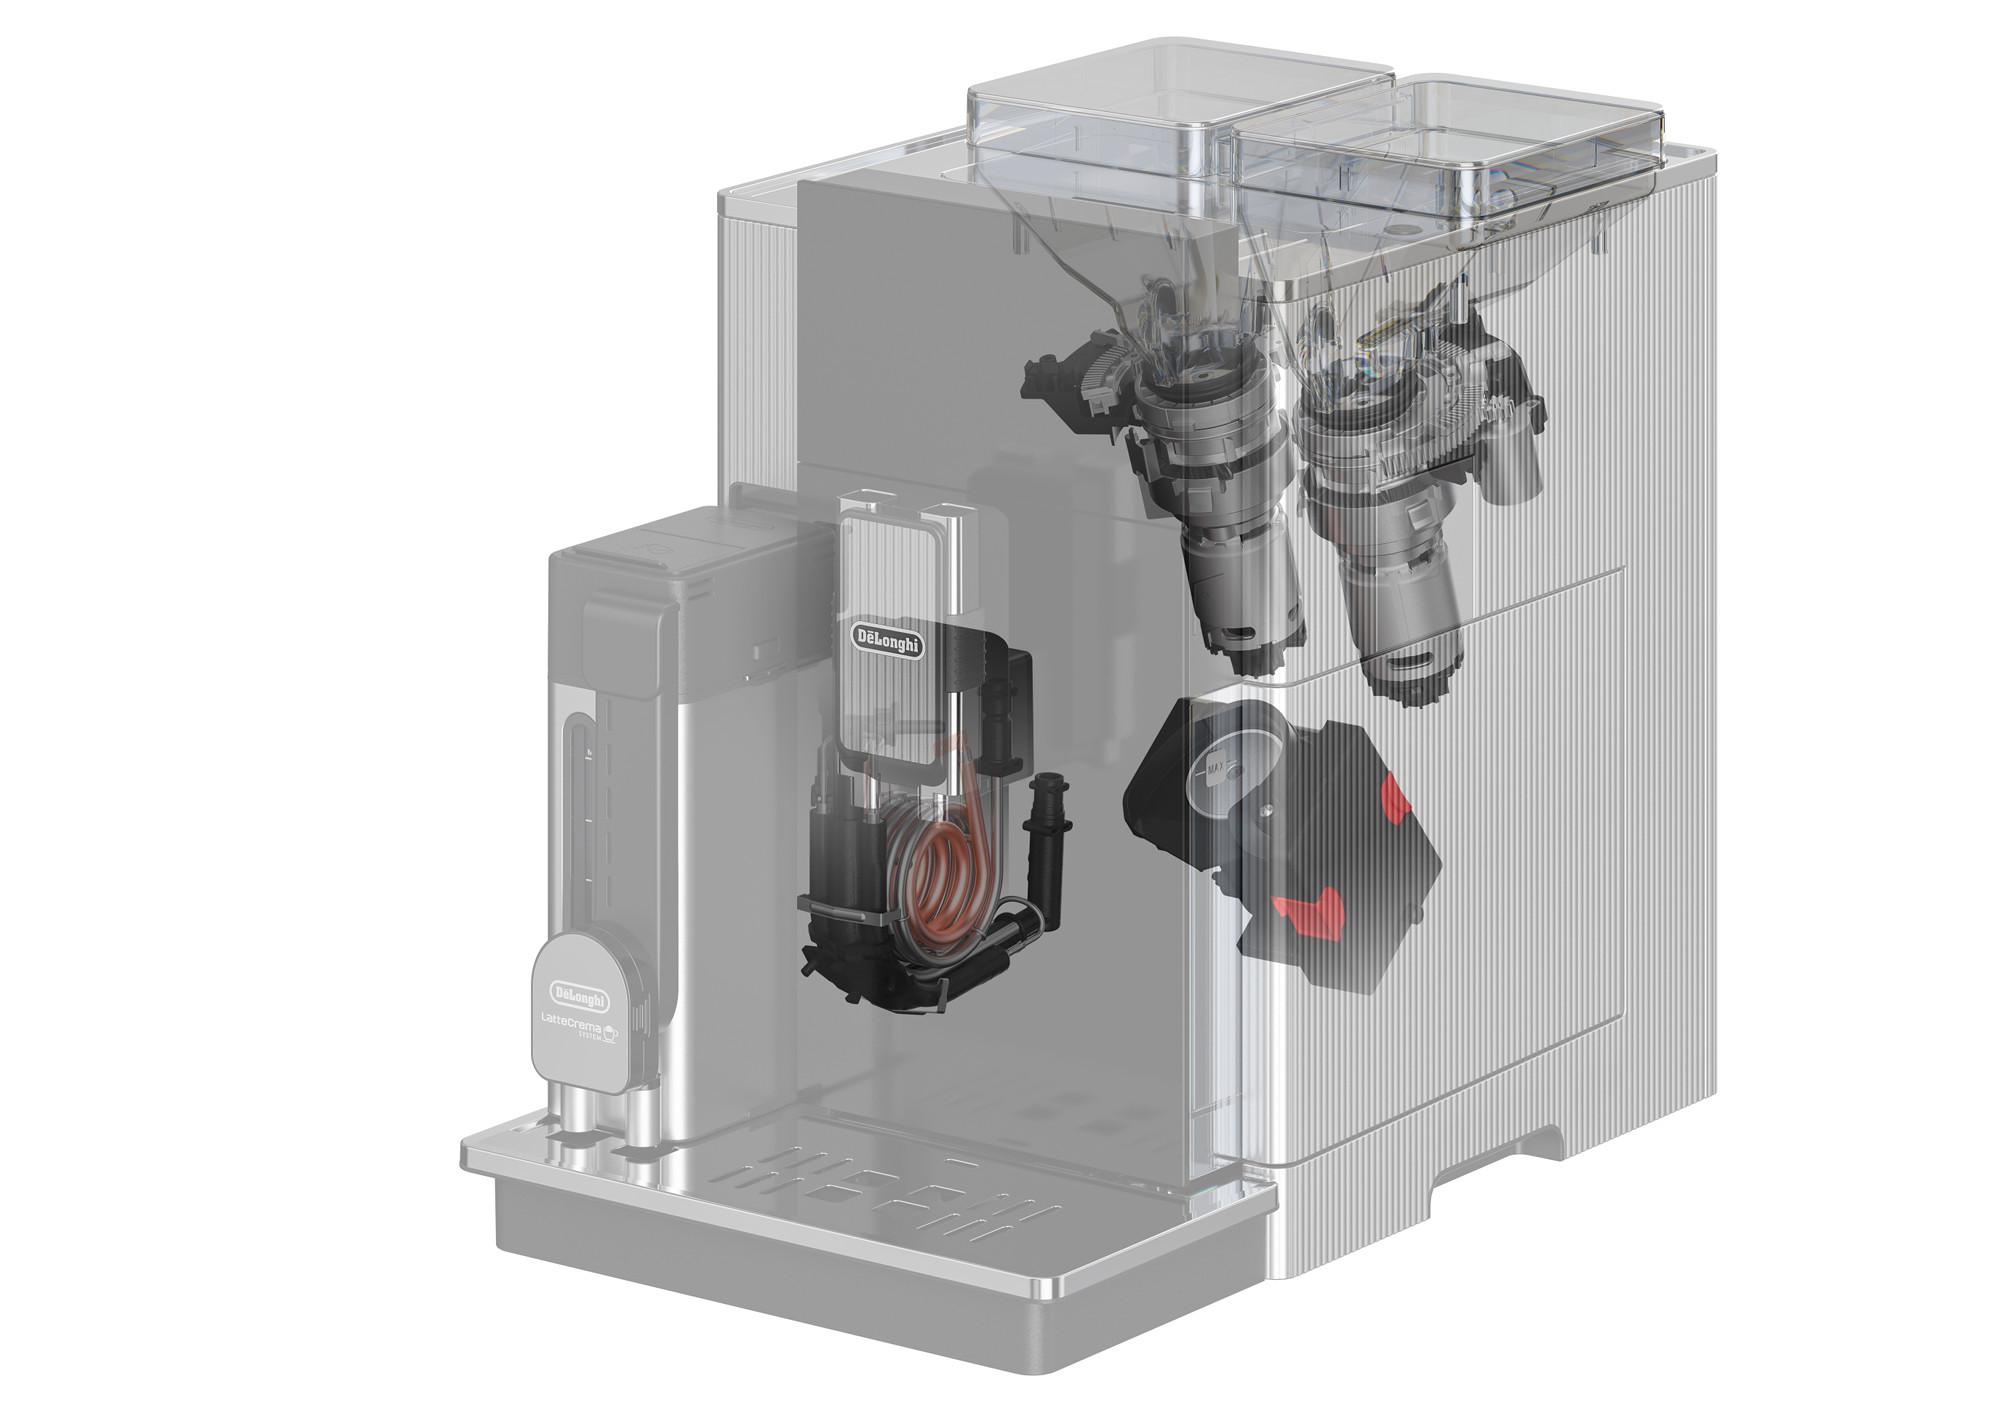 Aufbau eines Kaffeevollautomaten